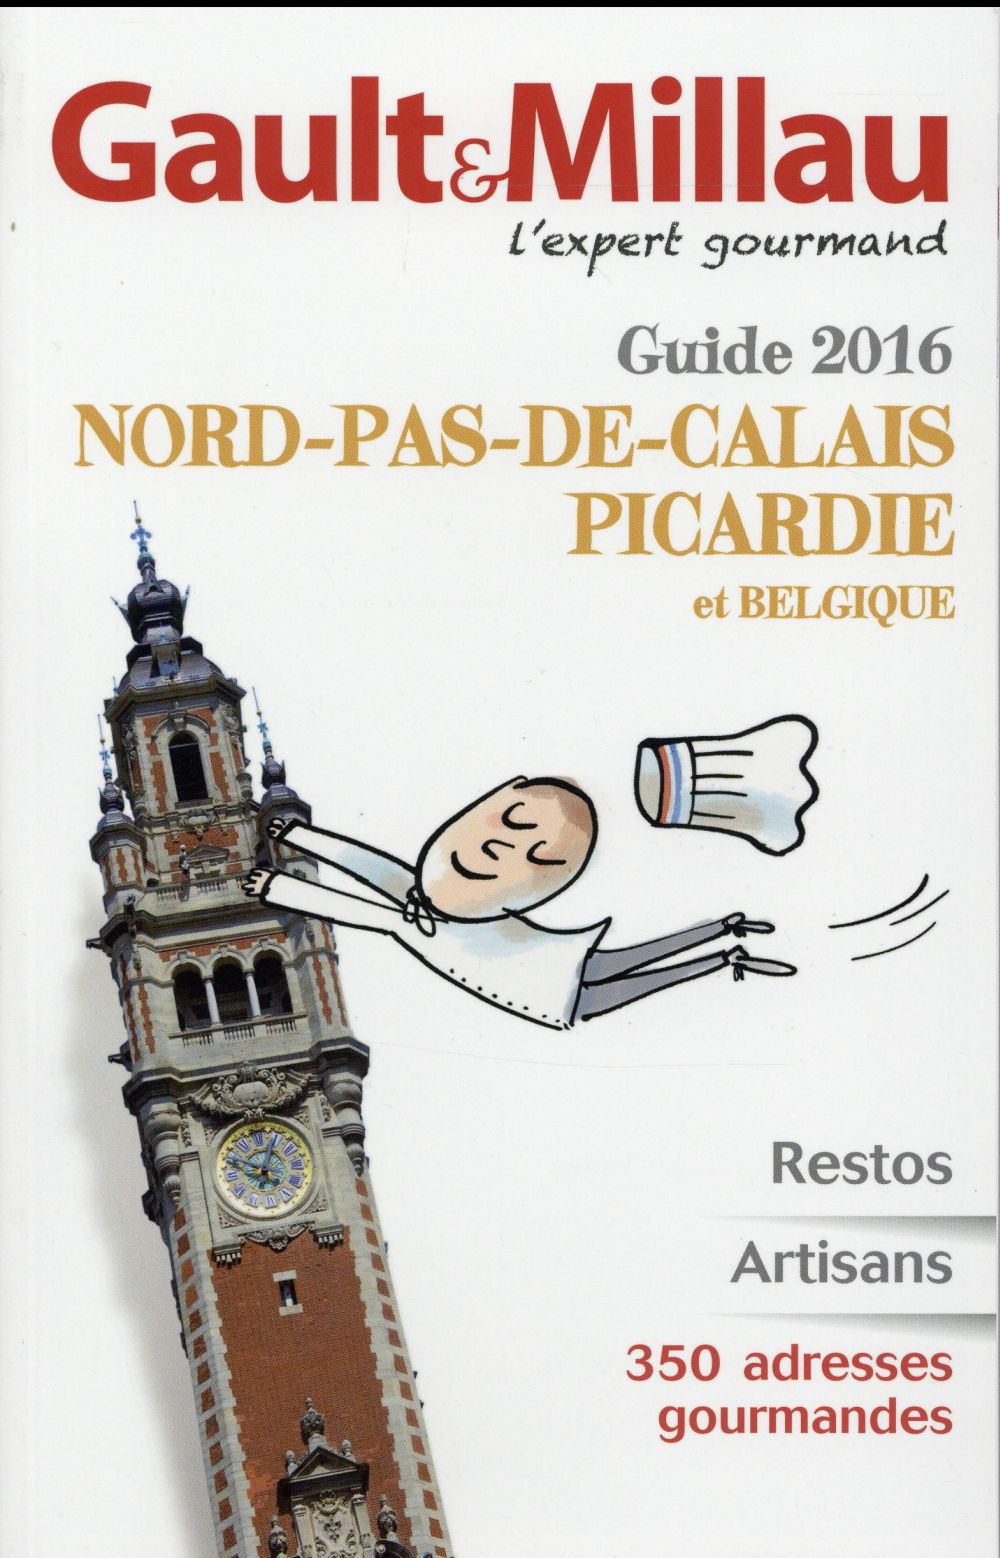 GUIDE NORD-PAS-DE-CALAIS, PICARDIE 2016